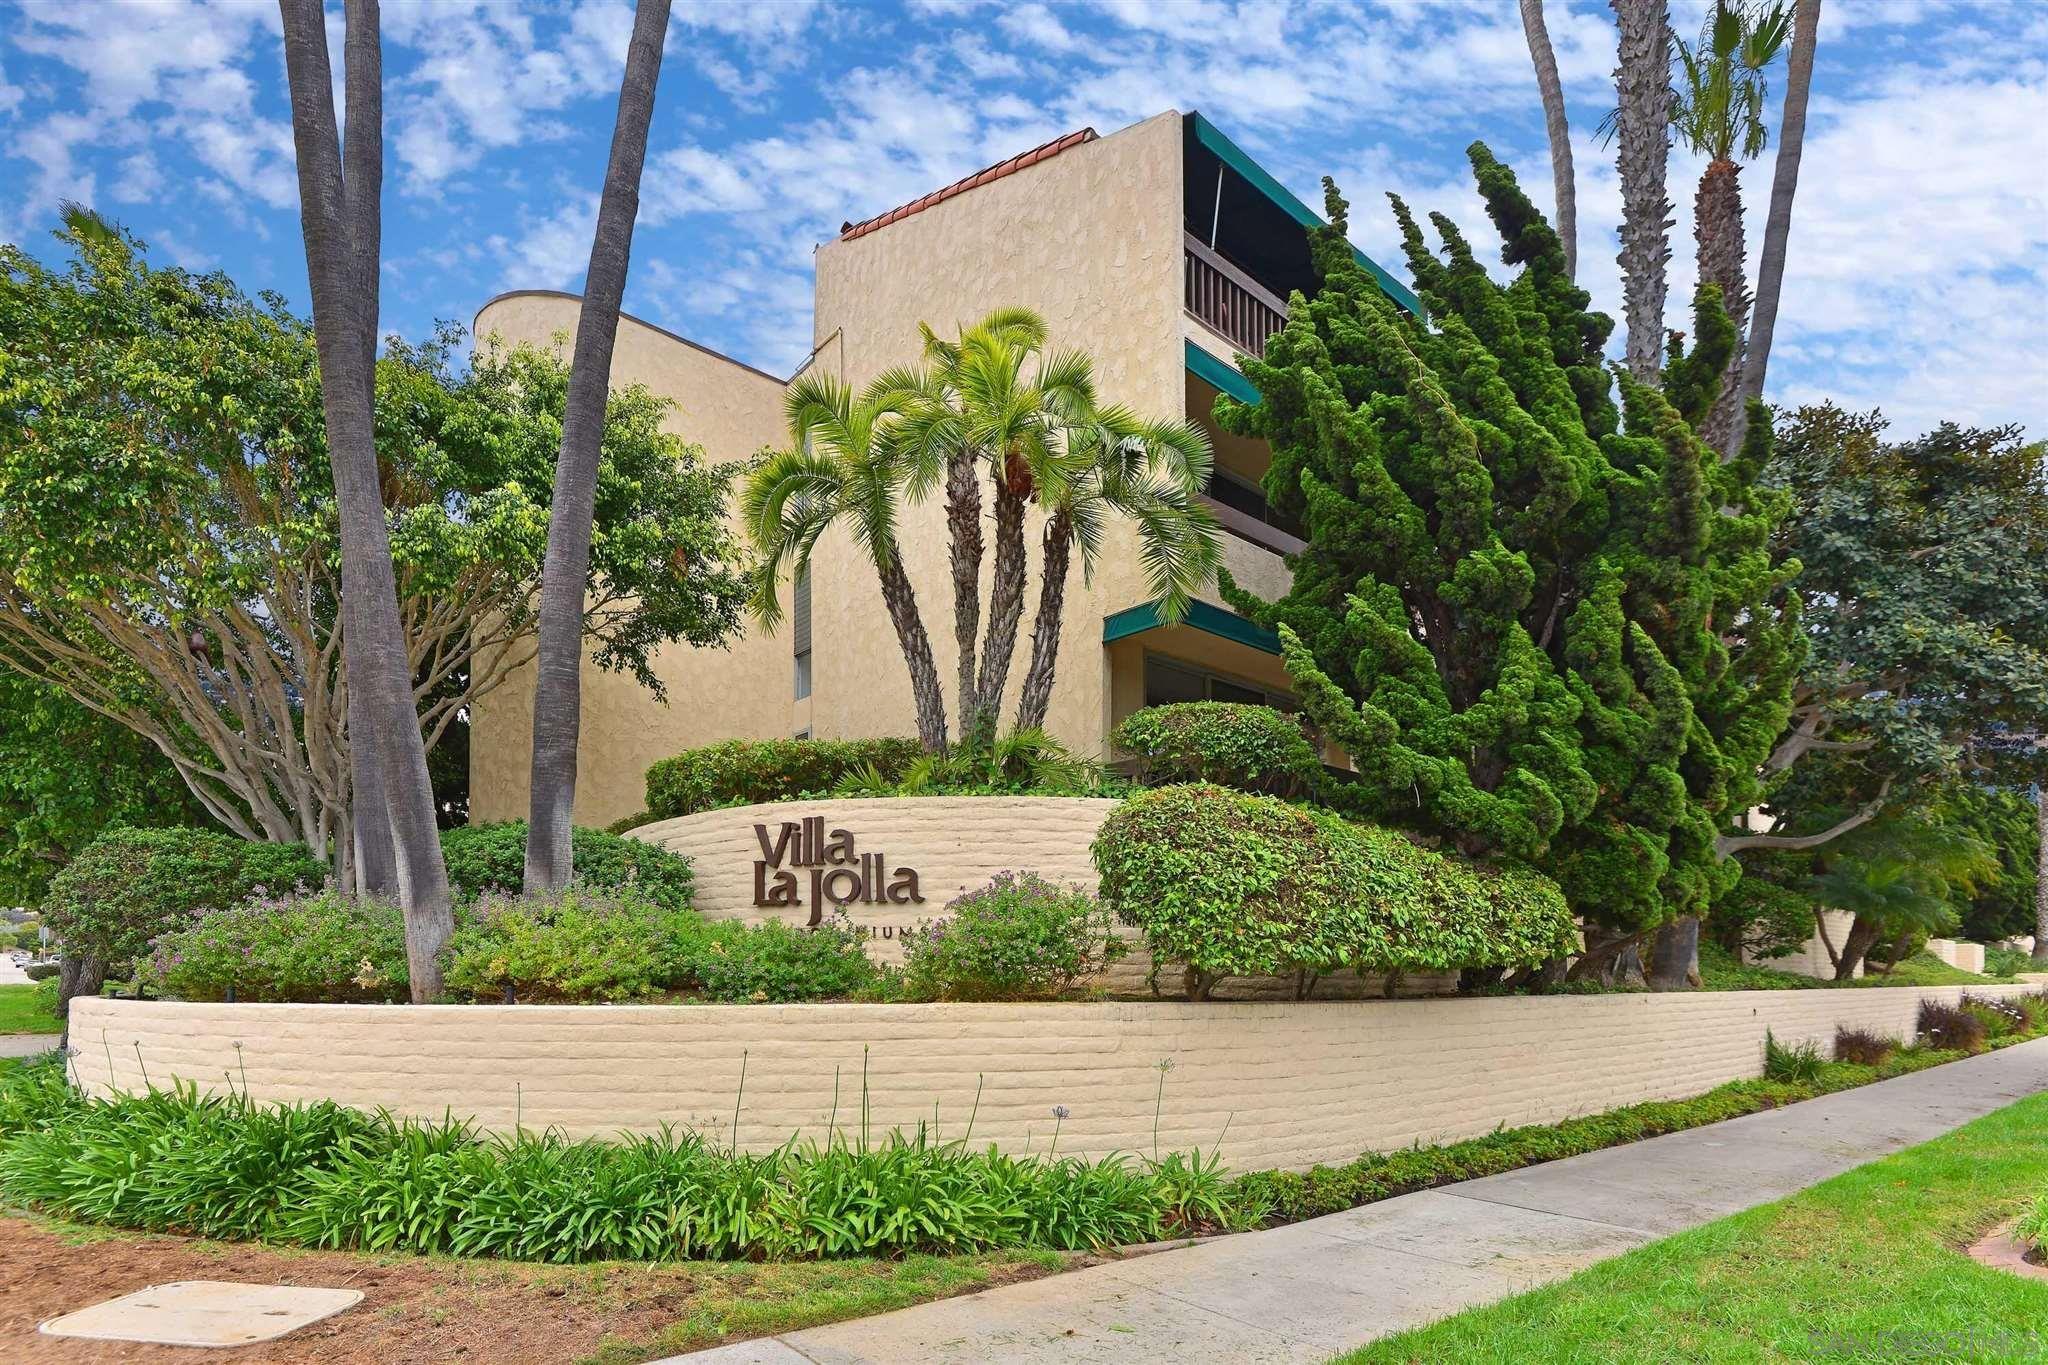 Main Photo: LA JOLLA Condo for sale : 2 bedrooms : 6455 La Jolla Blvd #115